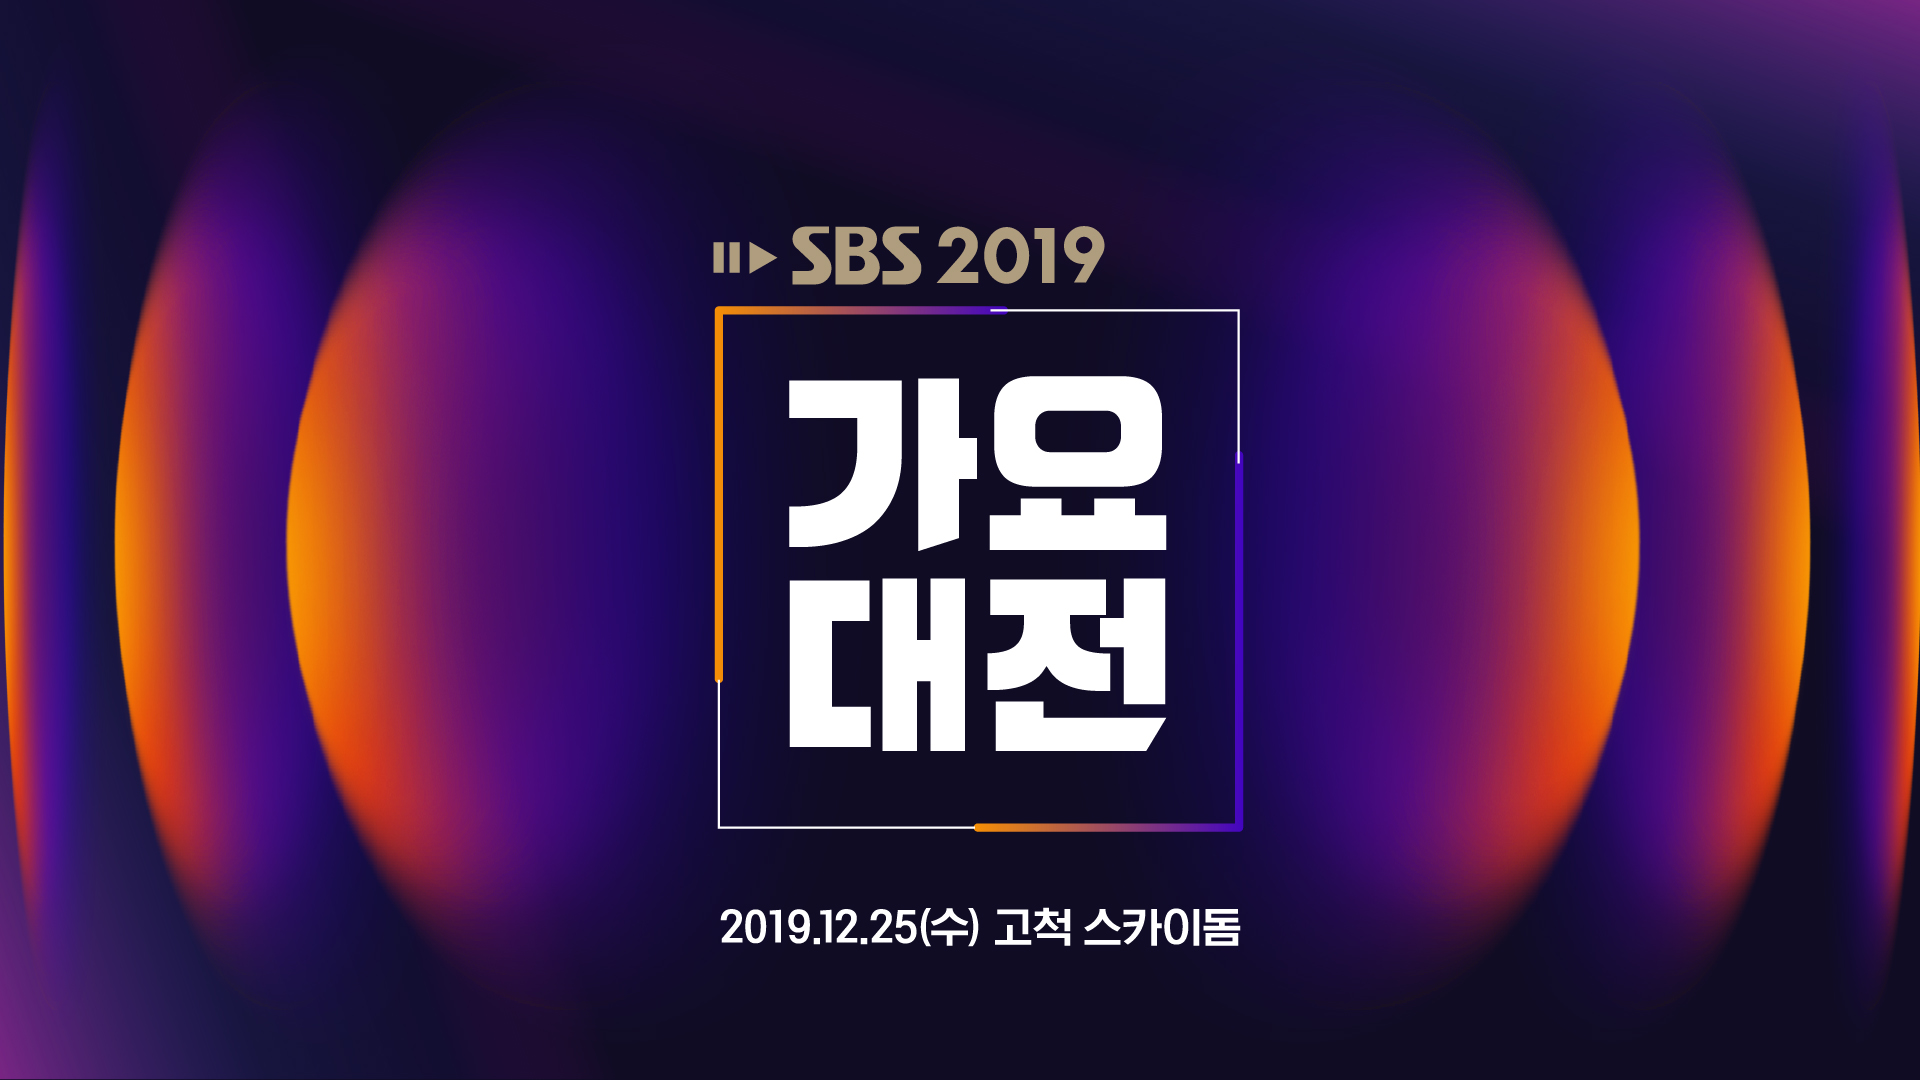 SBS Gayo Daejeon(Daejun) 2019: Lineup